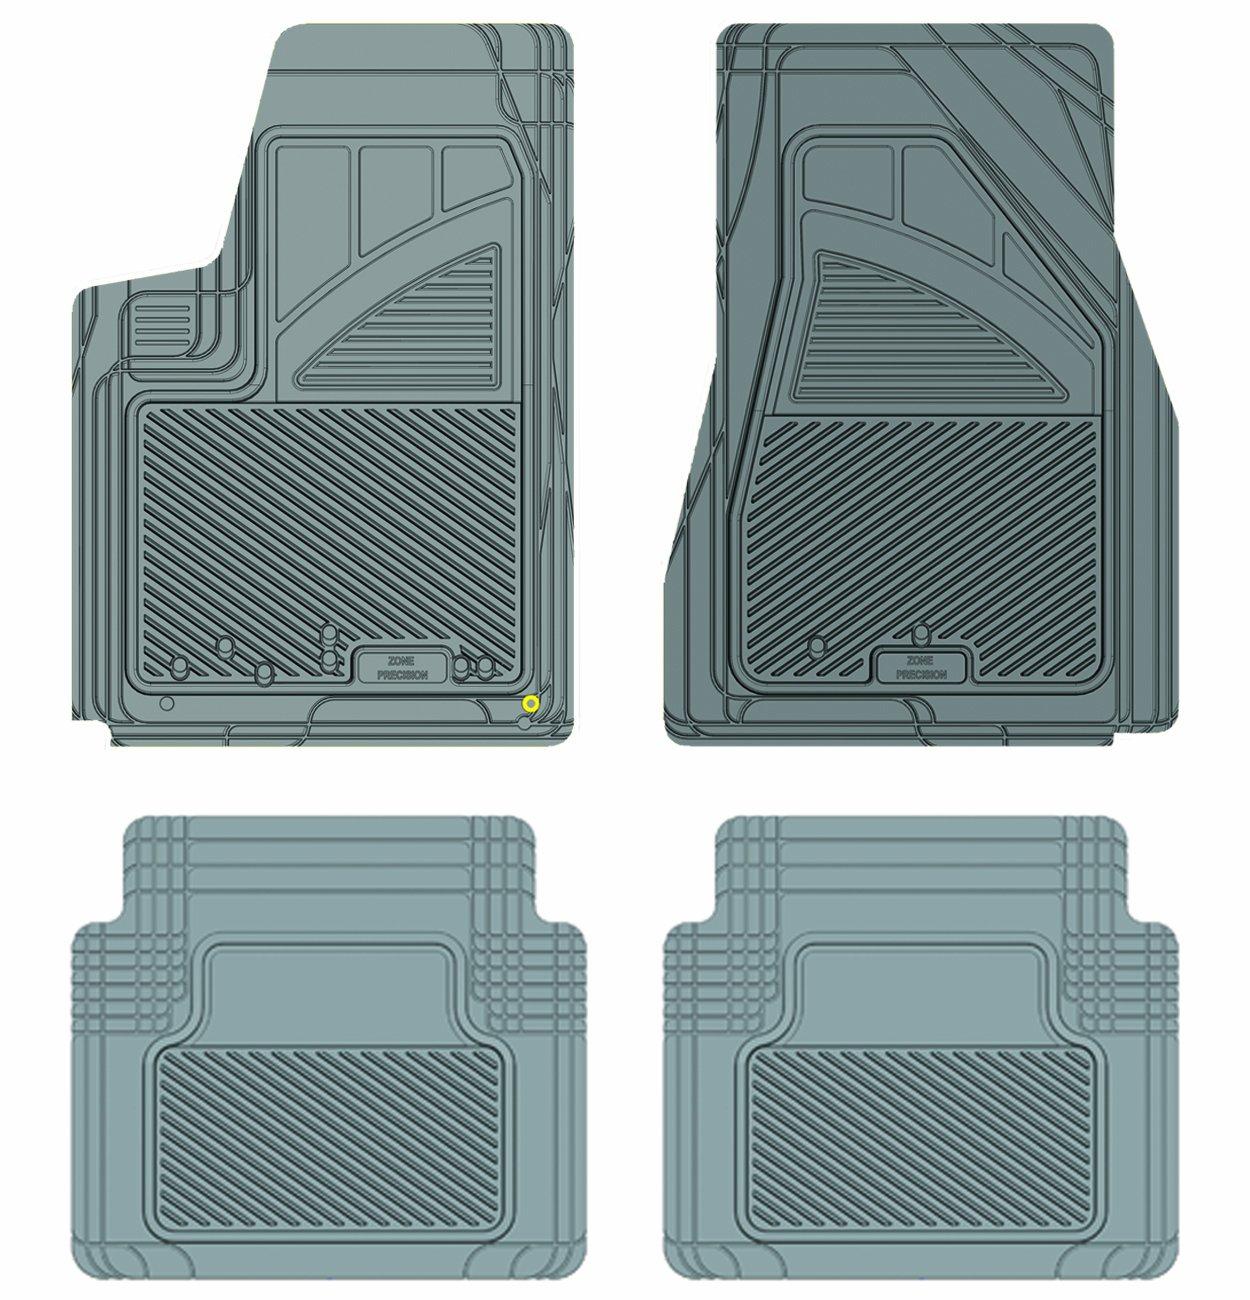 Koolatron Pants Saver Custom Fit 4 Piece All Weather Car Mat for Select Chrysler 300 Models Black